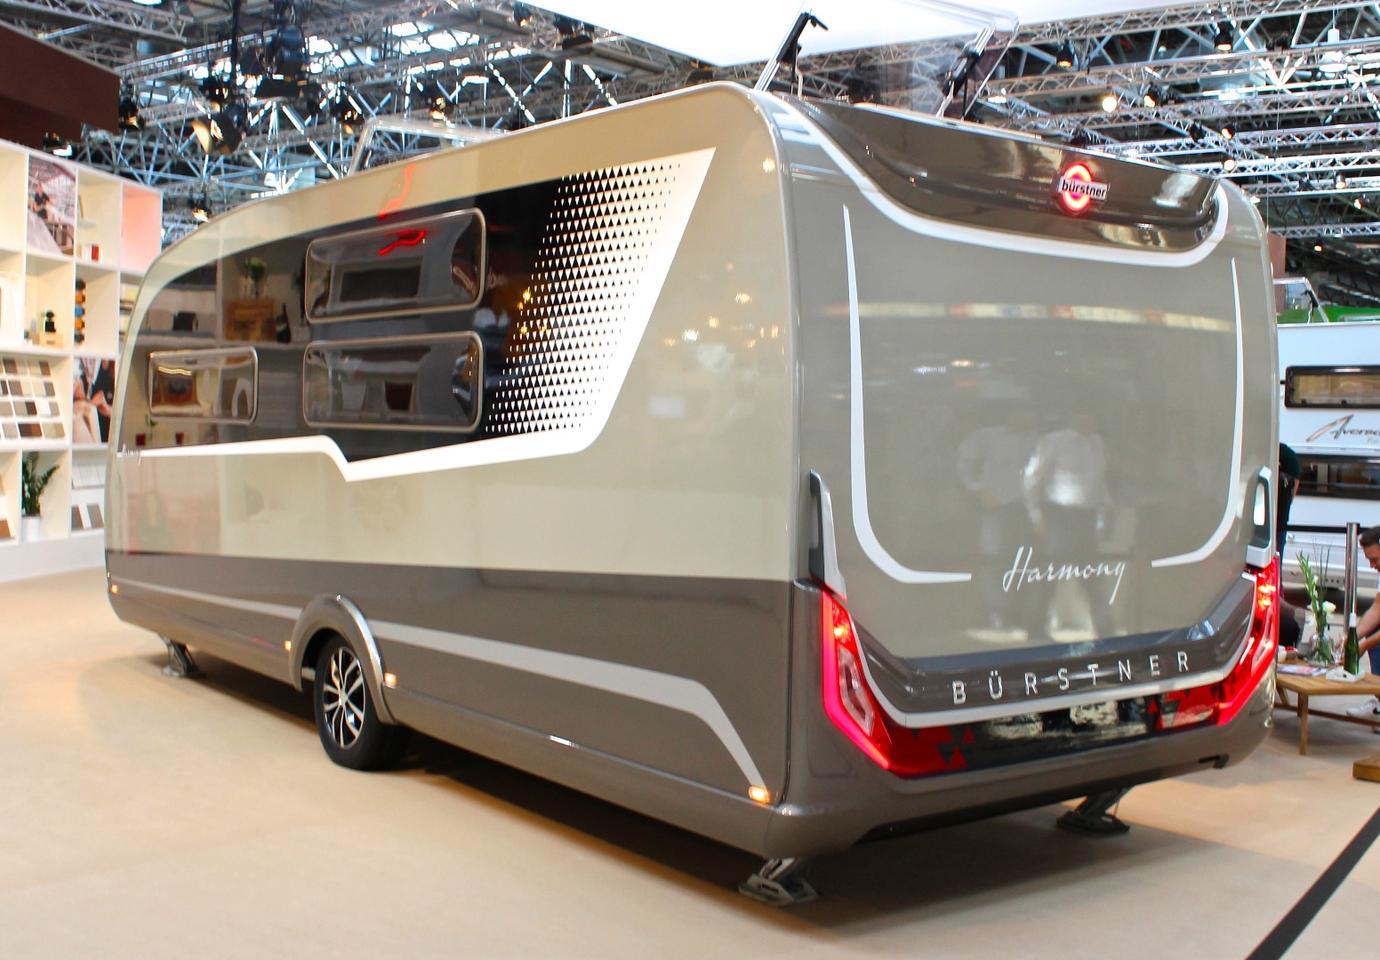 BürstnerHarmony 3 concept caravan